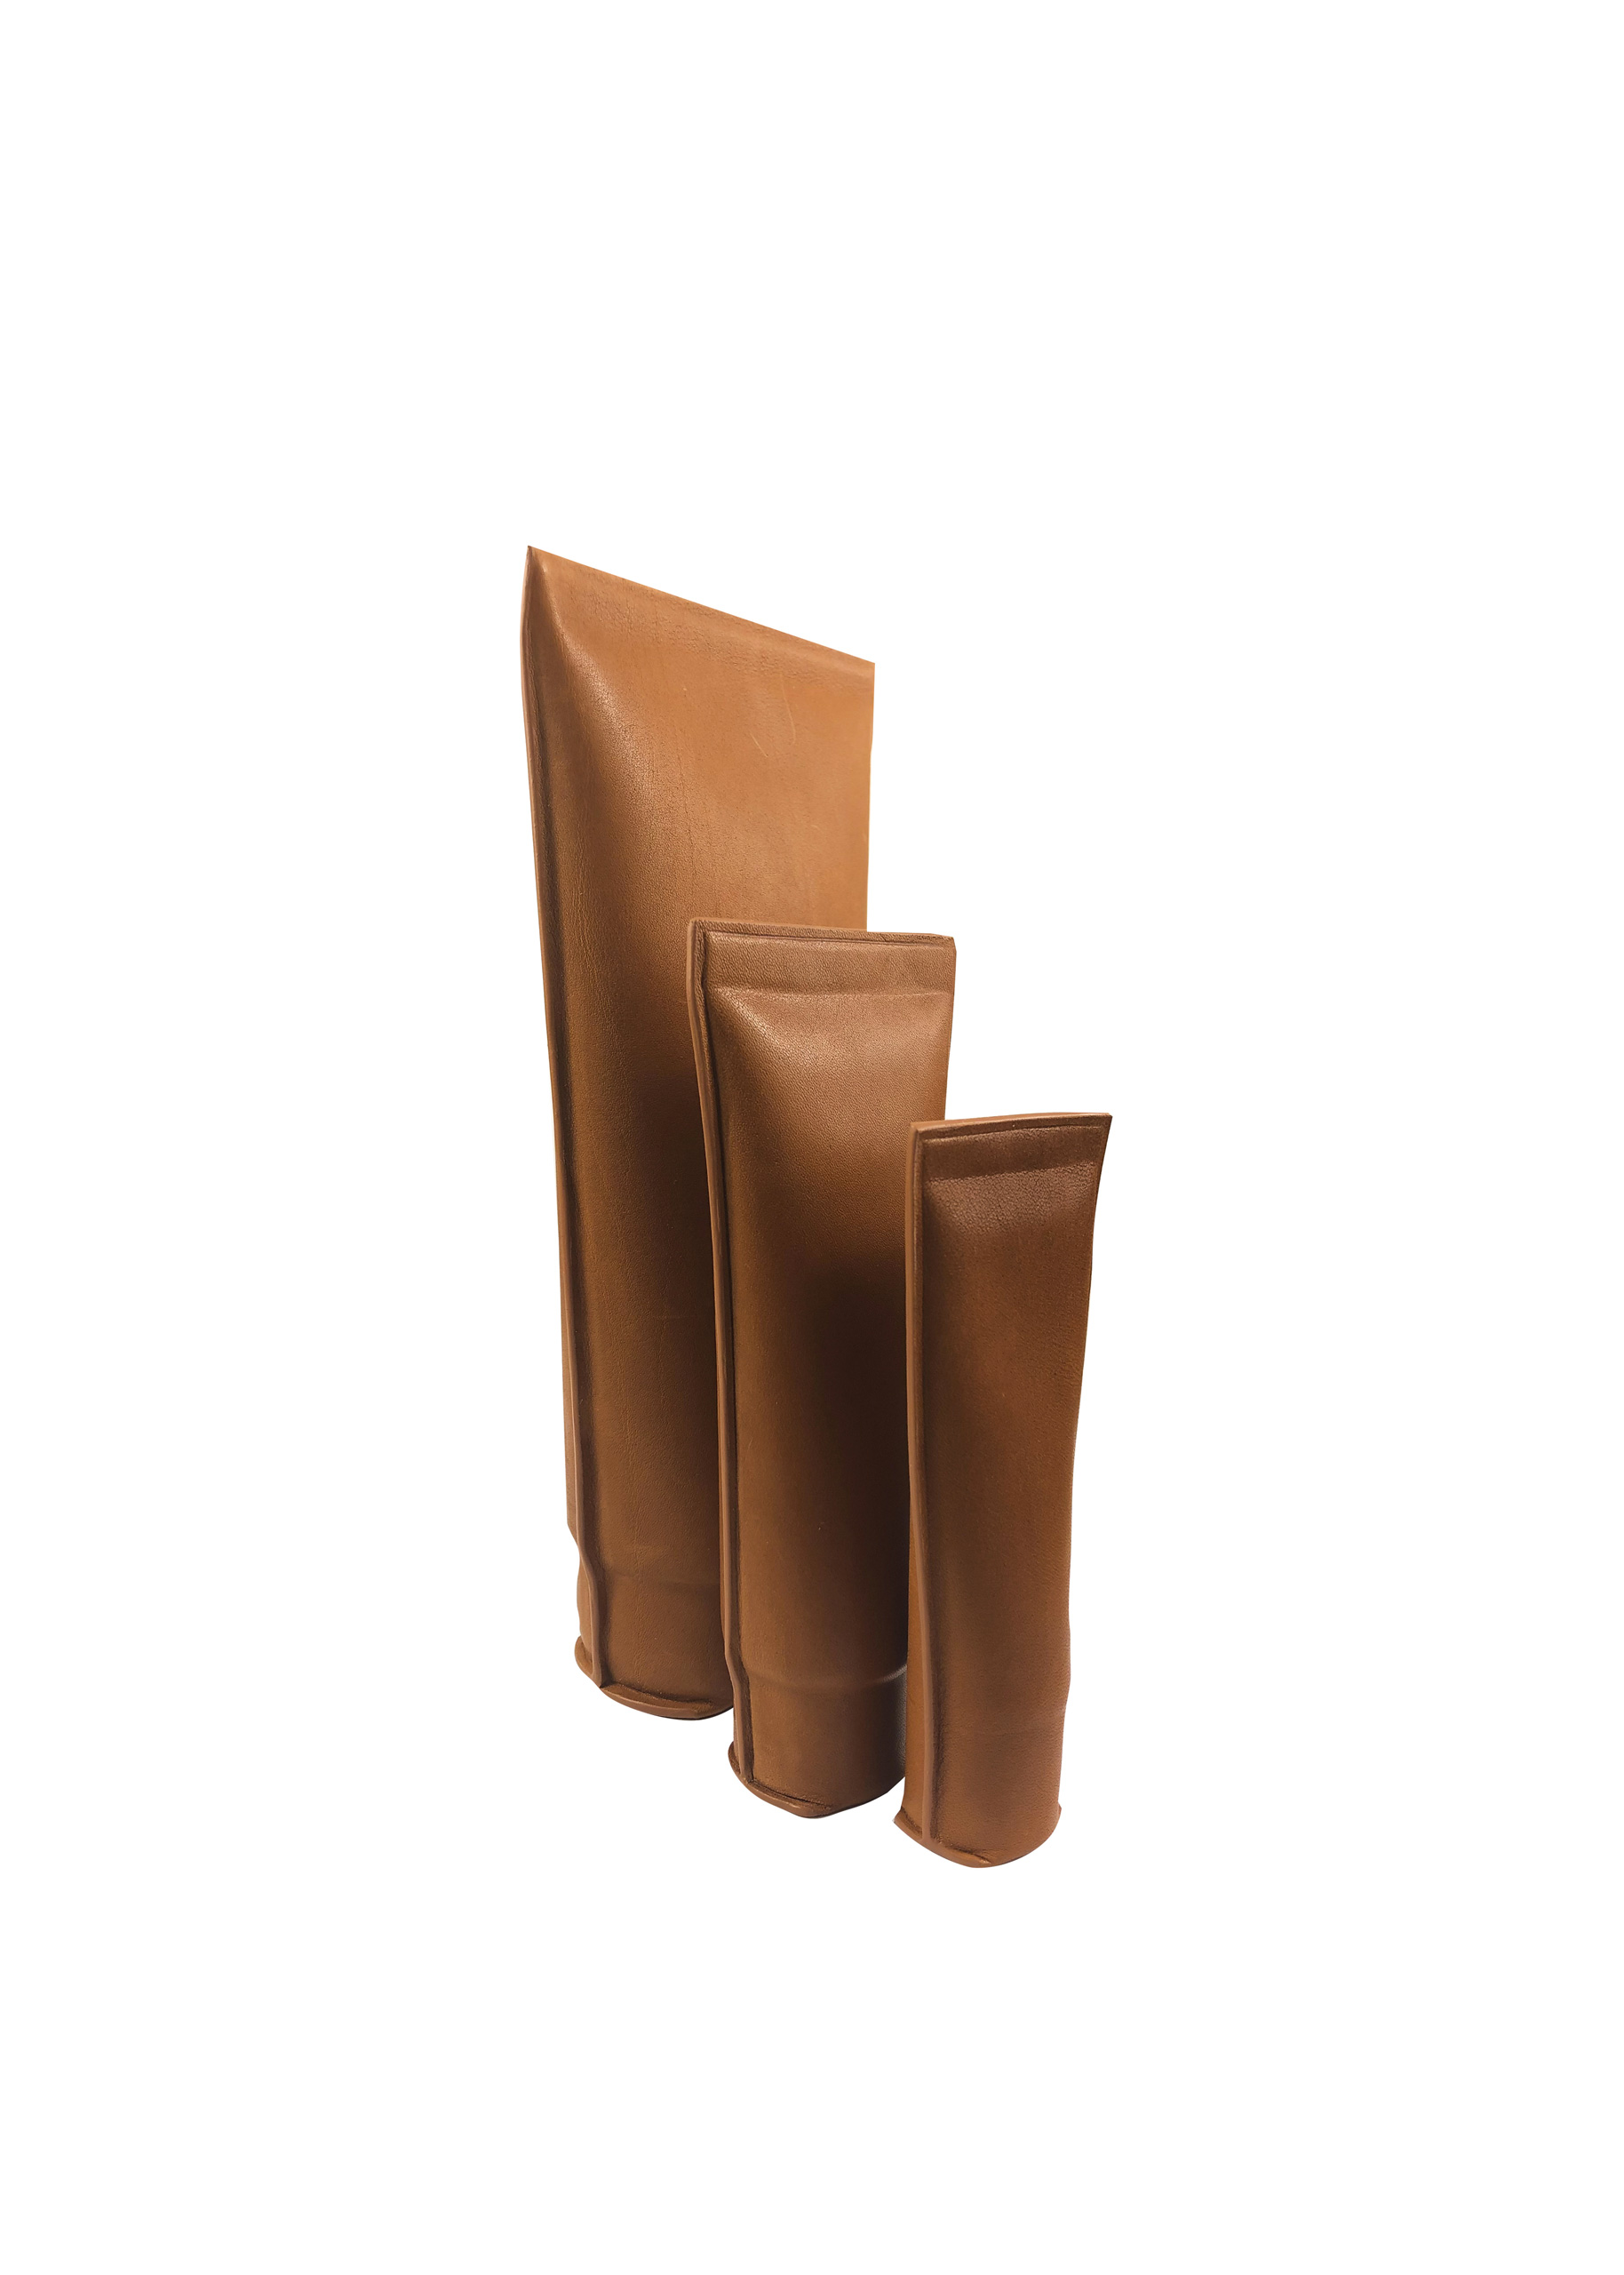 handmade leather tube